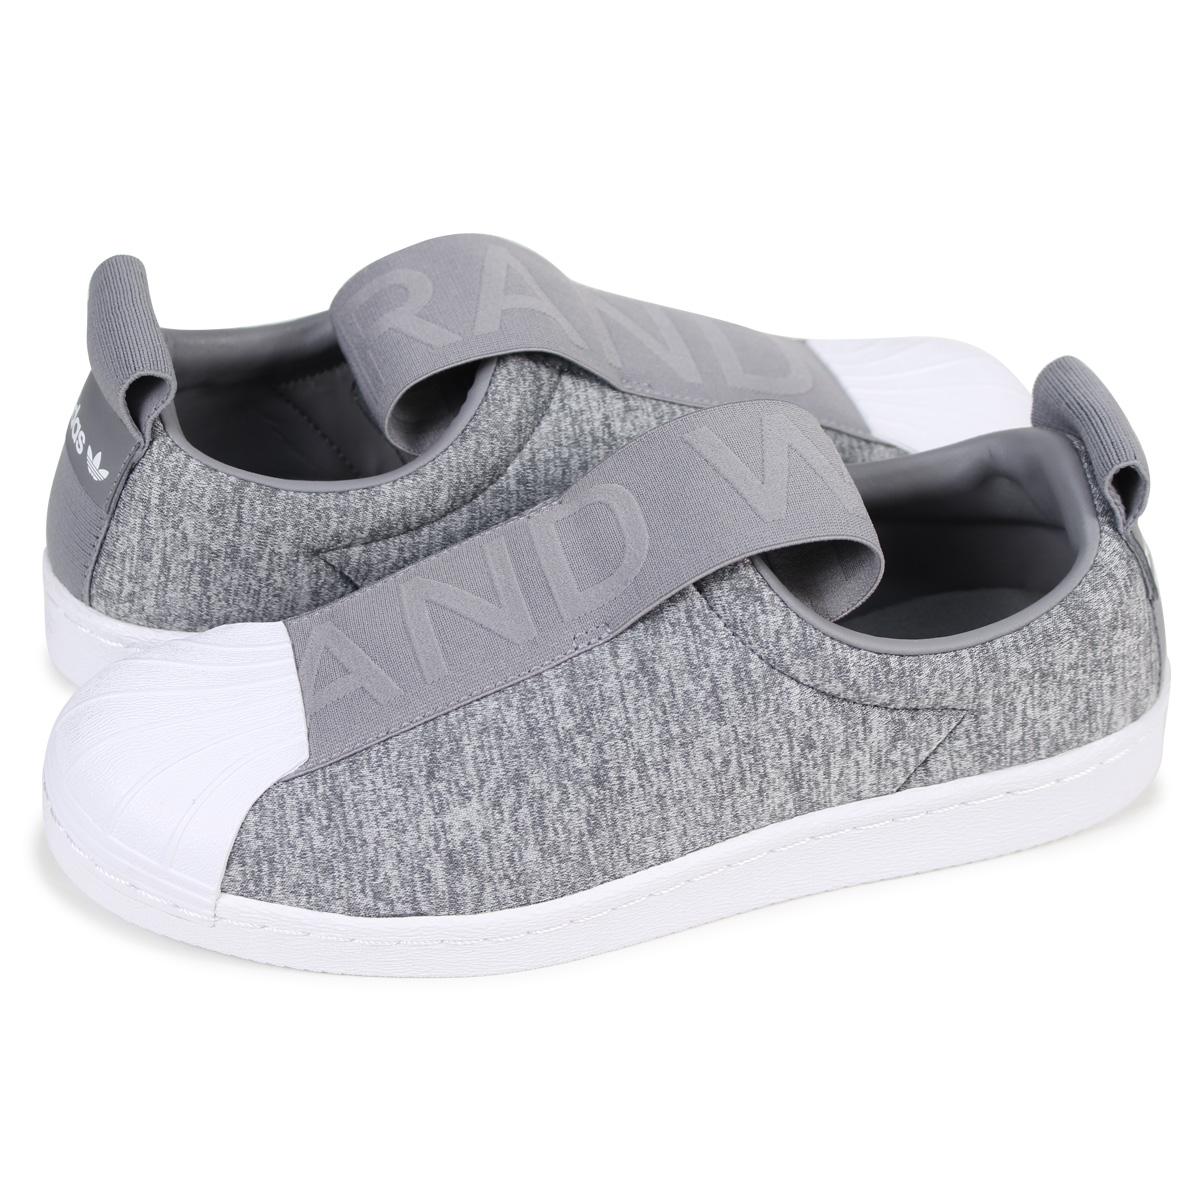 size 40 b4ad8 21ce3 adidas Originals SUPER STAR BW3S SLIP-ON W Adidas superstar Lady's sneakers  slip-ons CQ2520 gray originals